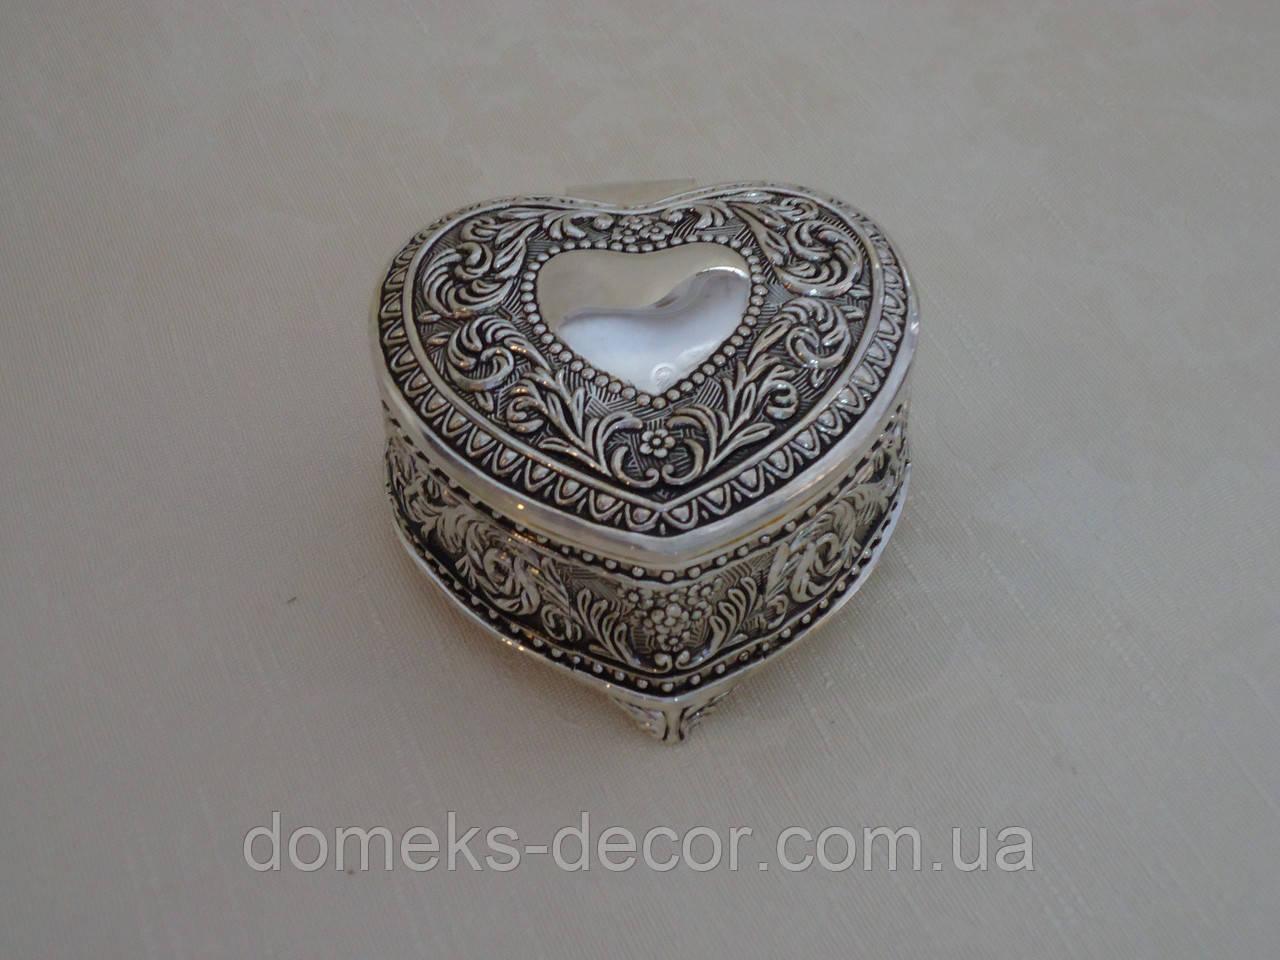 Шкатулка из мельхиора сердце, фото 1